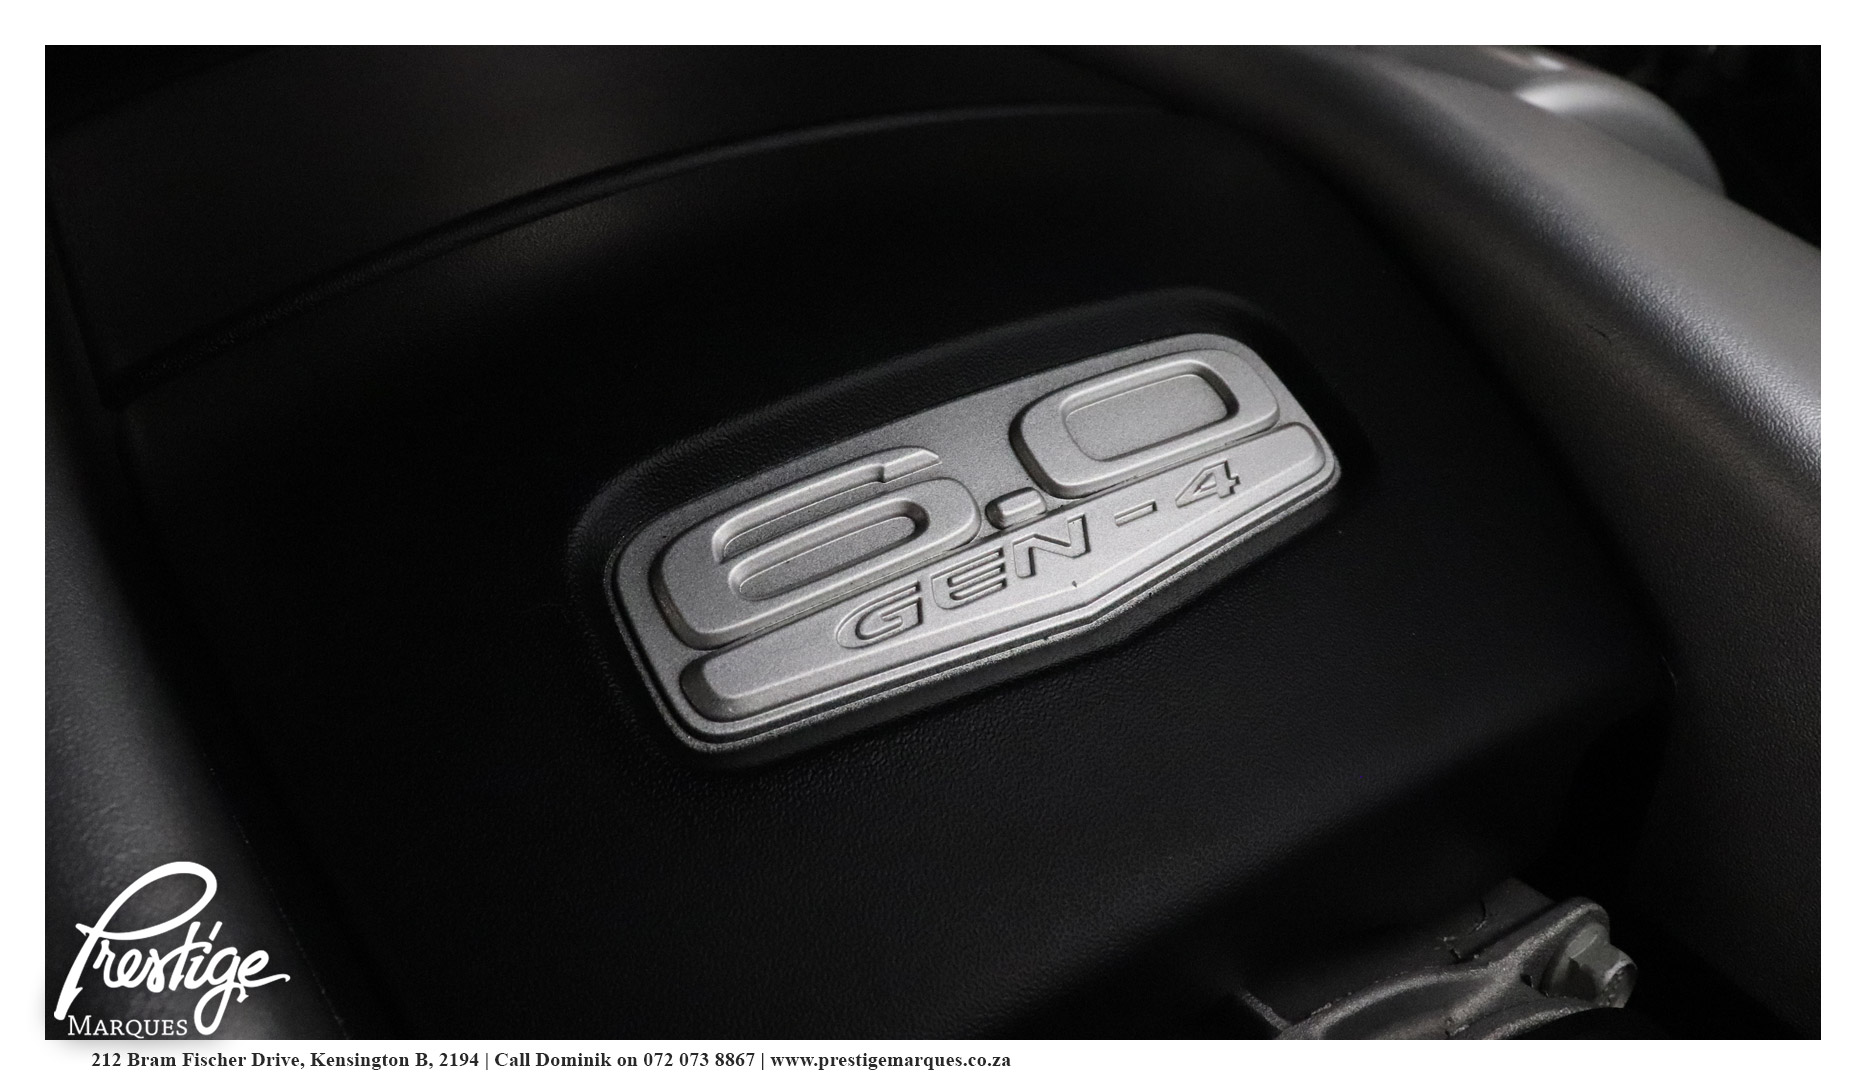 2008-Chevrolet-Lumina-SS-5.4-Manual-Prestige-Marques-Randburg-Sandton-11